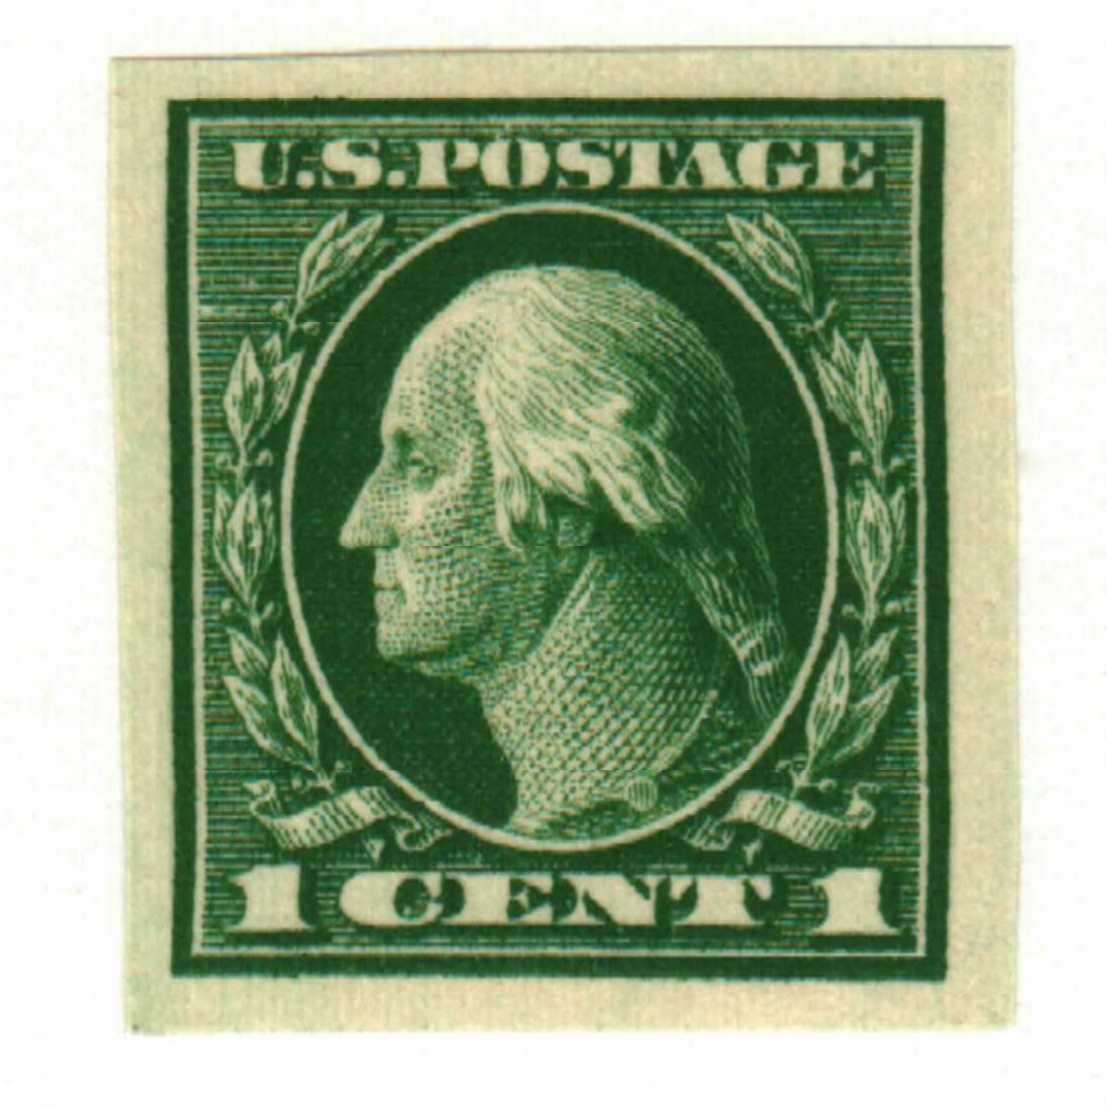 1912 1c Washington, green, single line watermark, imperforate